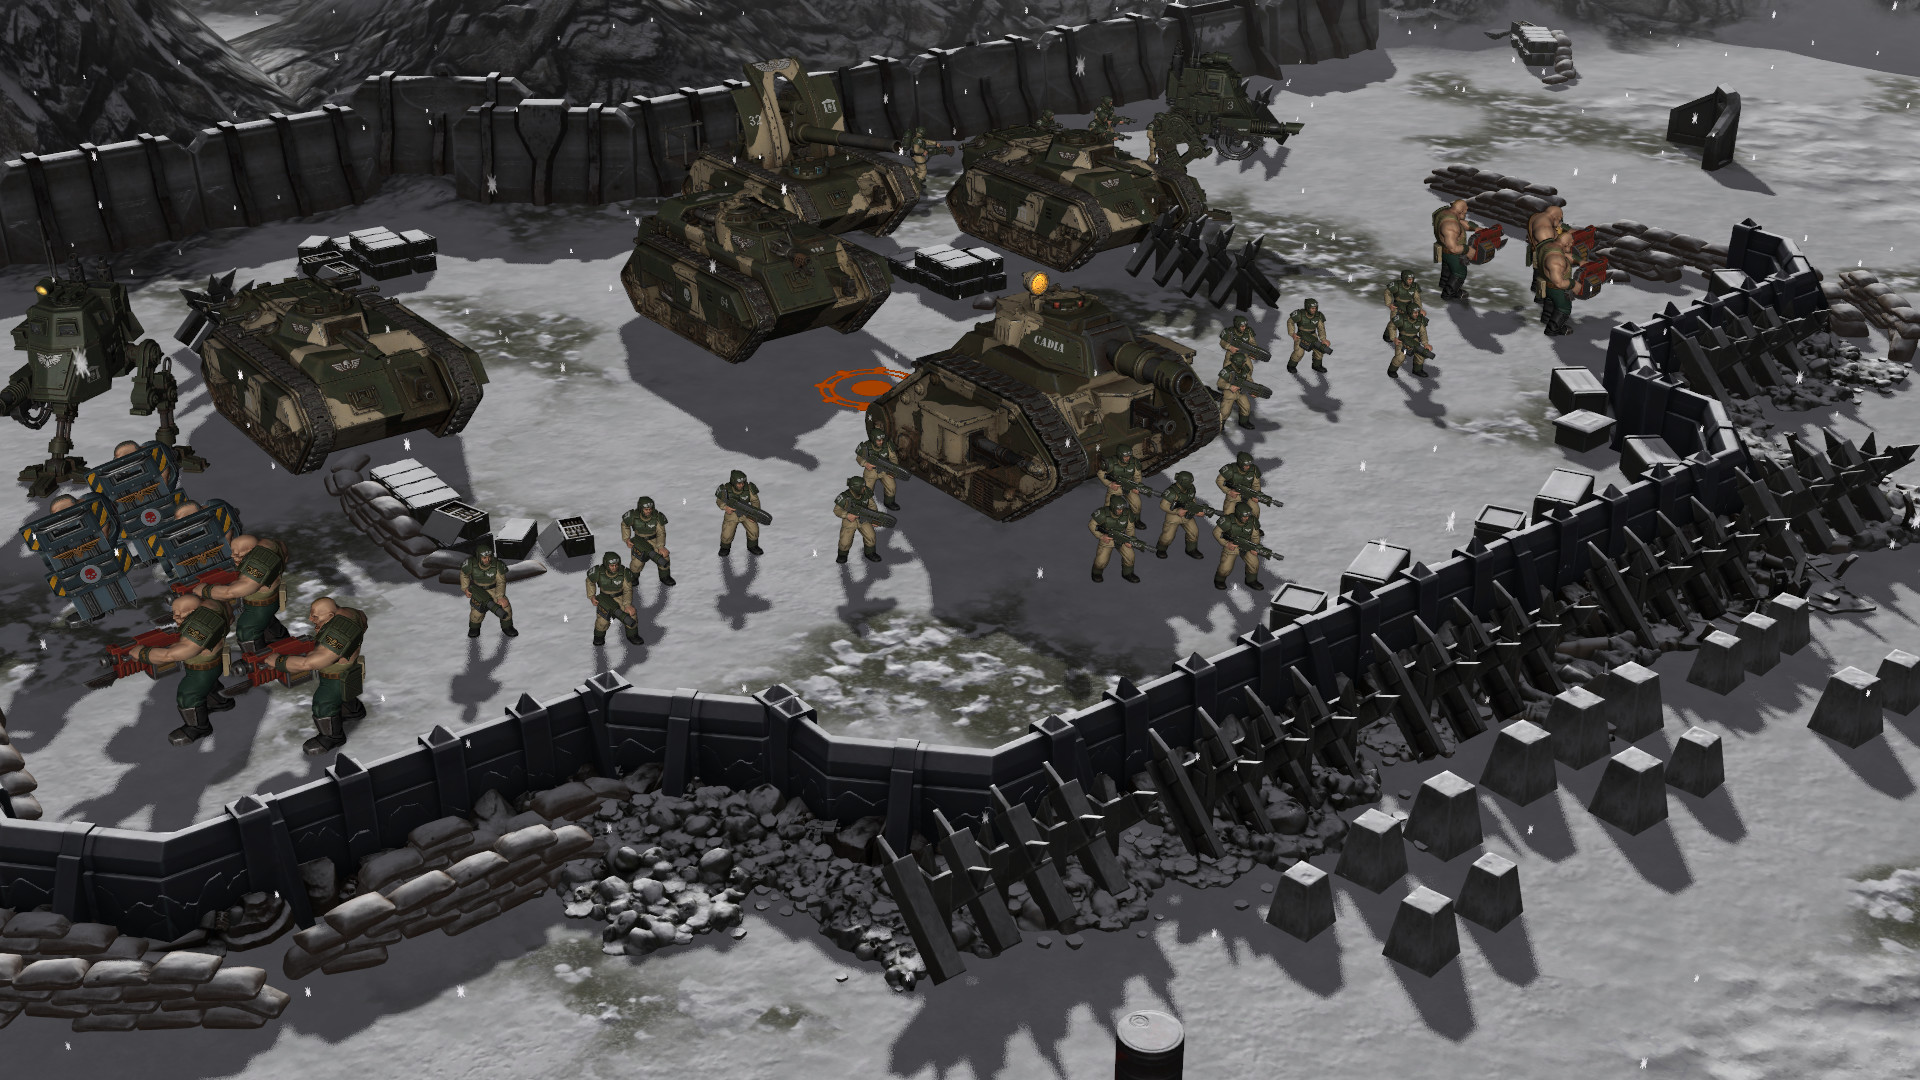 Free Fall Wallpaper Apps Warhammer 40 000 Sanctus Reach Sons Of Cadia V1 1 8